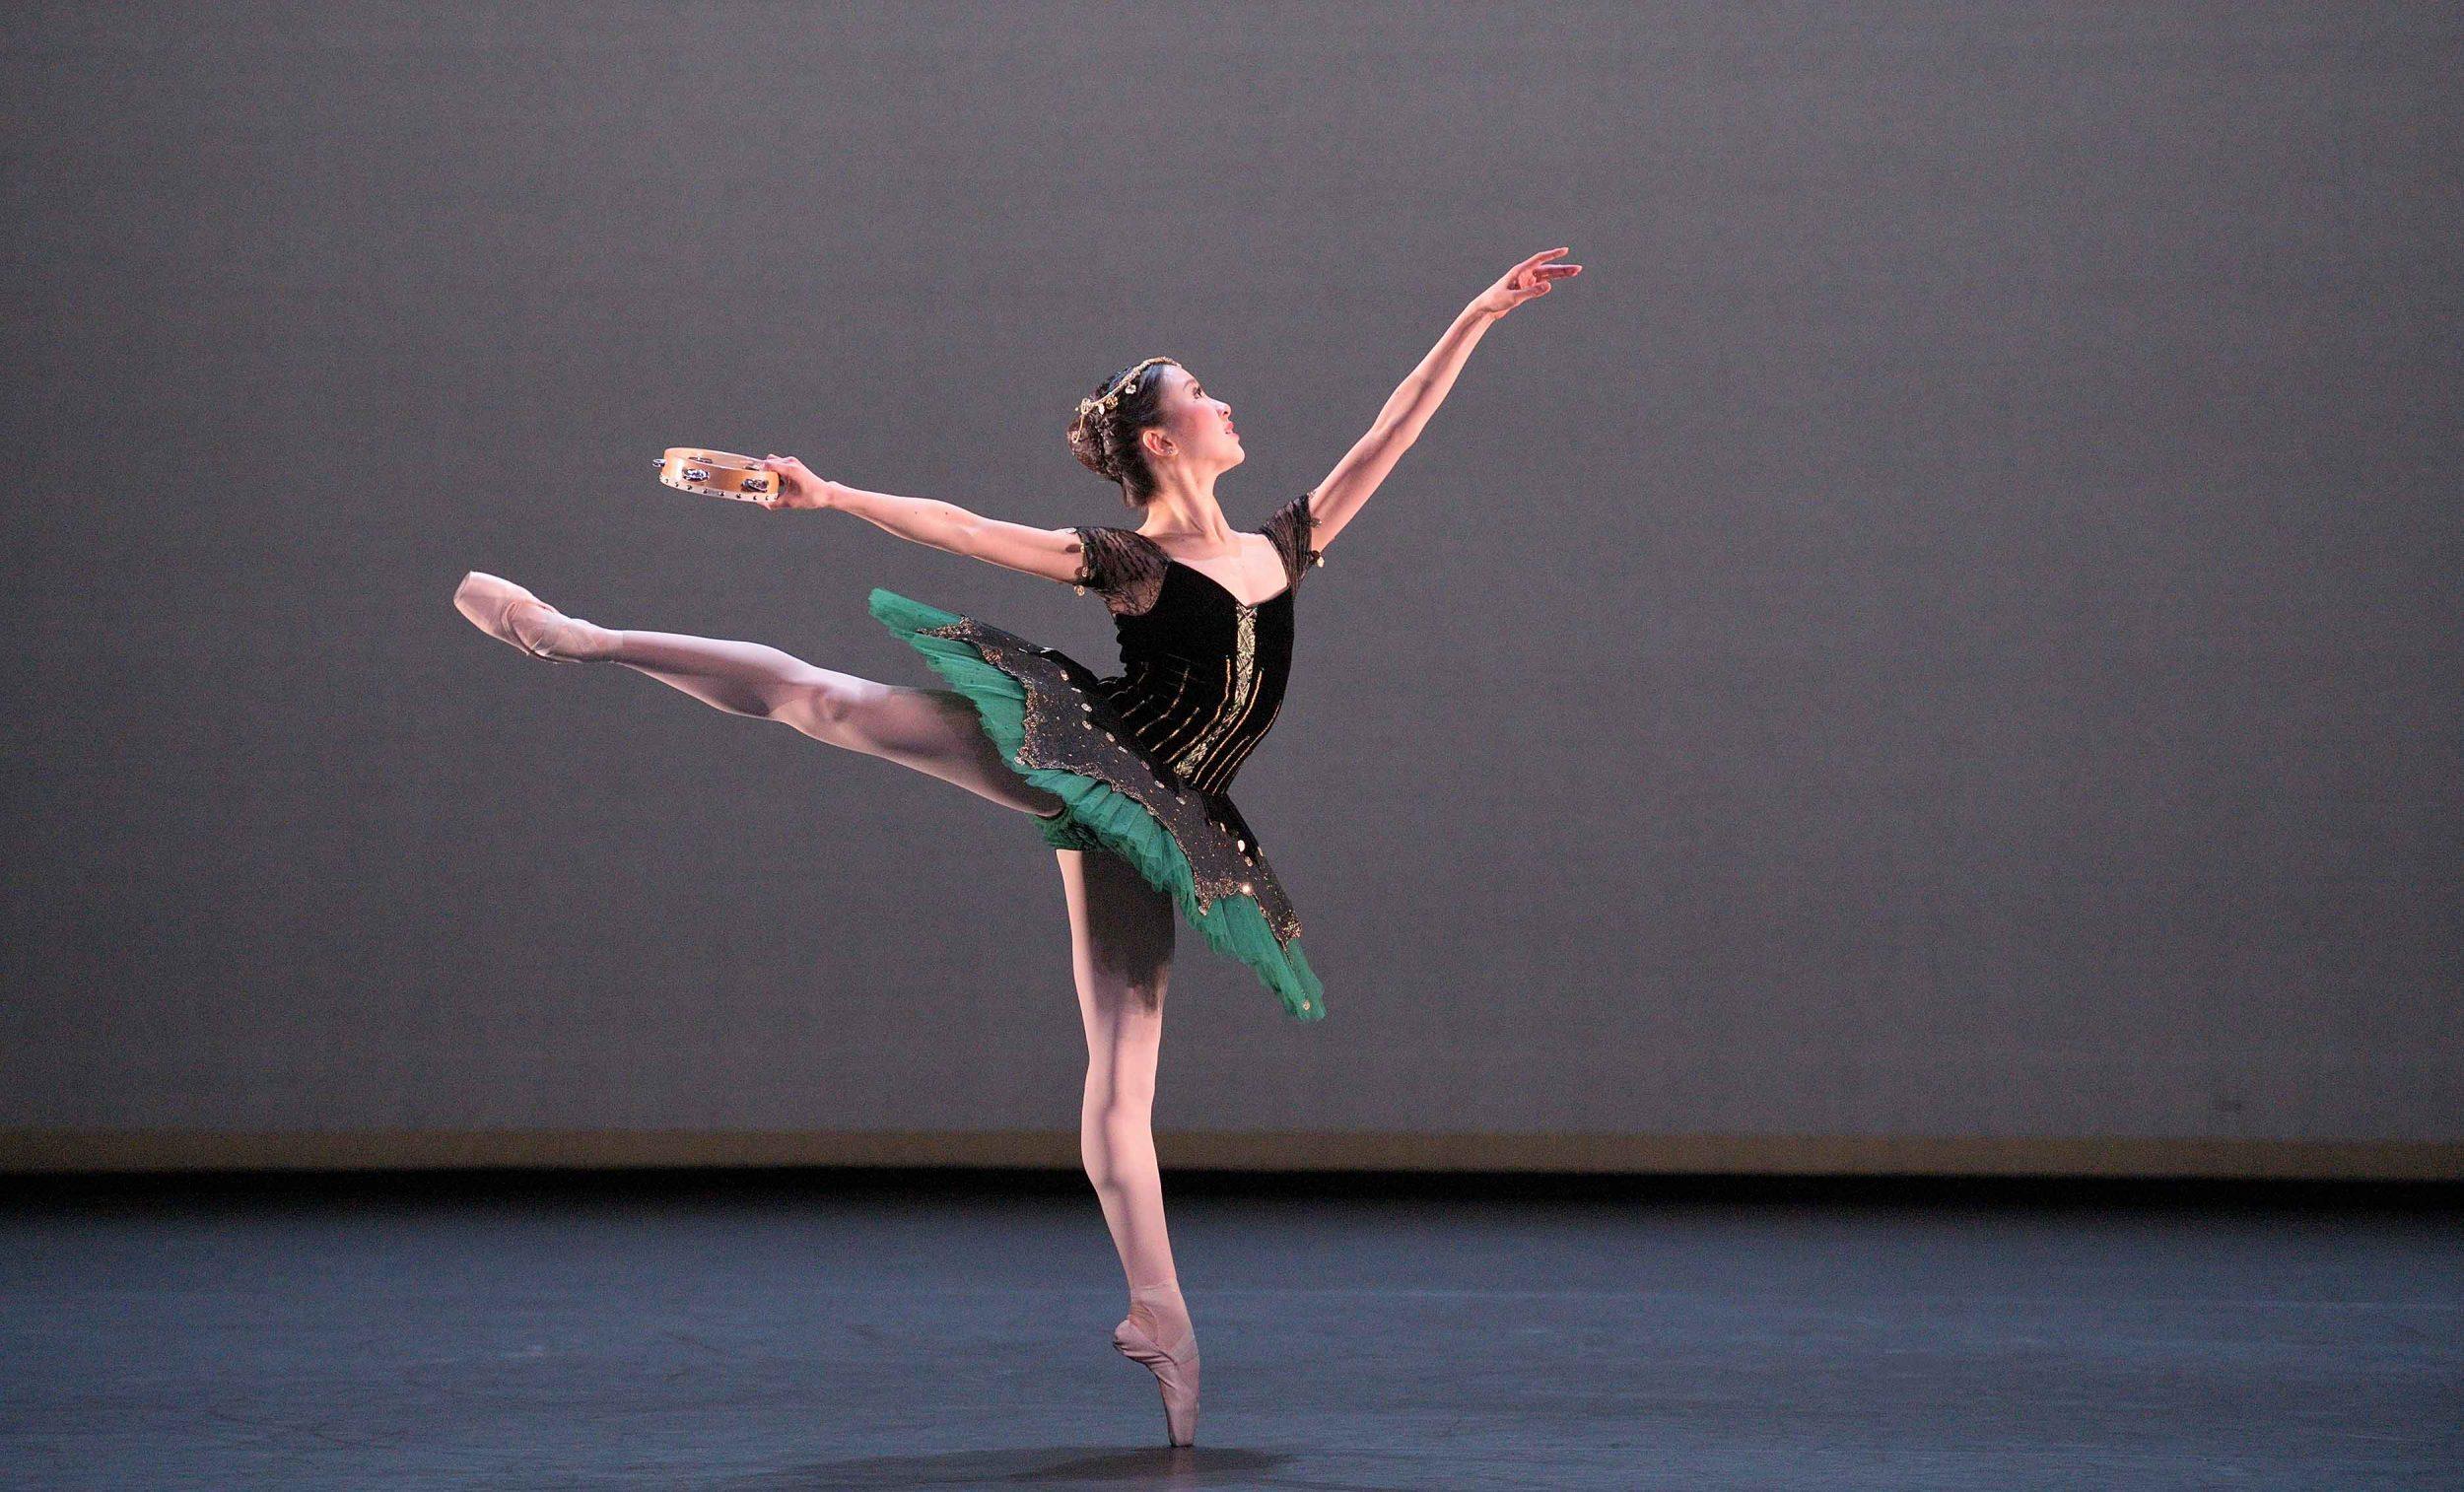 Rina-Kanehara-performing-the-Esmeralda-pas-de-deux-©-Laurent-Liotardo-(4)